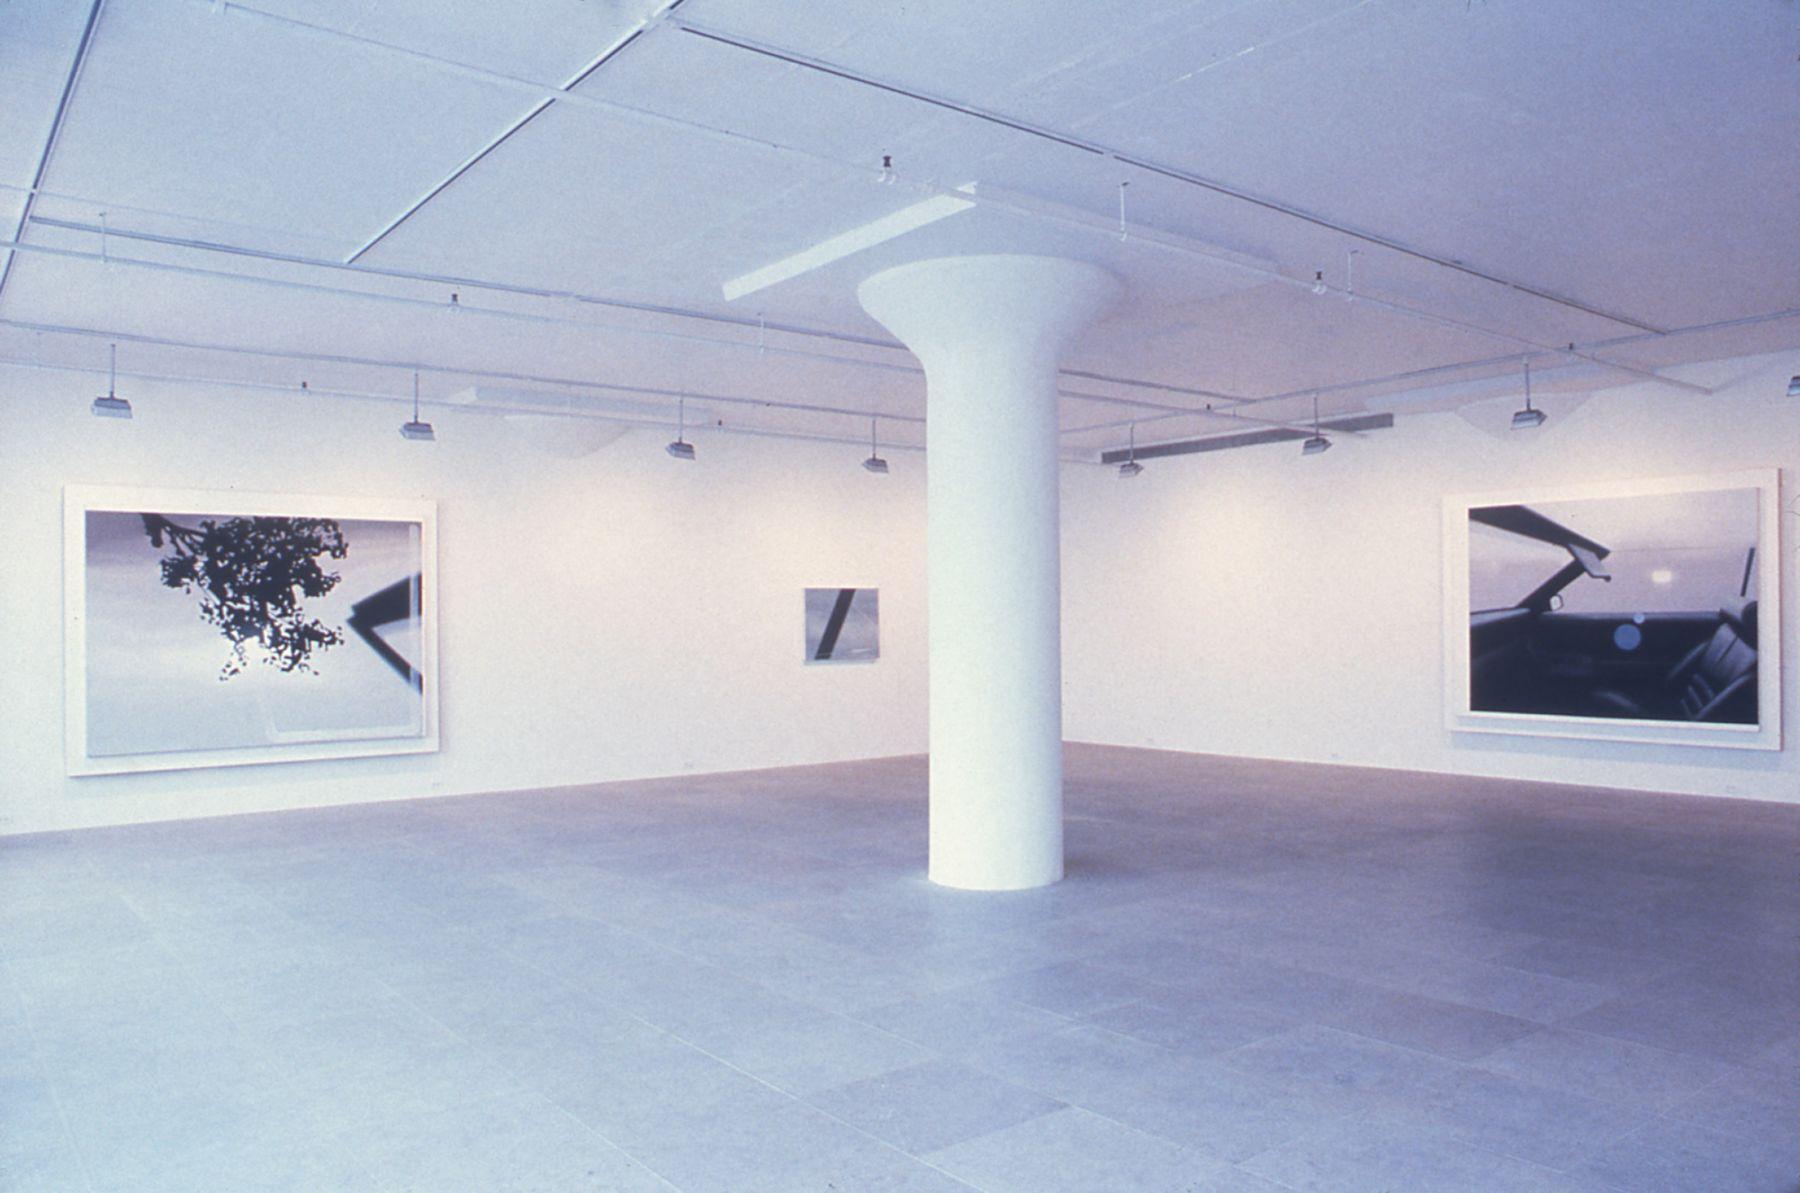 Installation view, Autumn Drive, Greene Naftali, New York, 1998